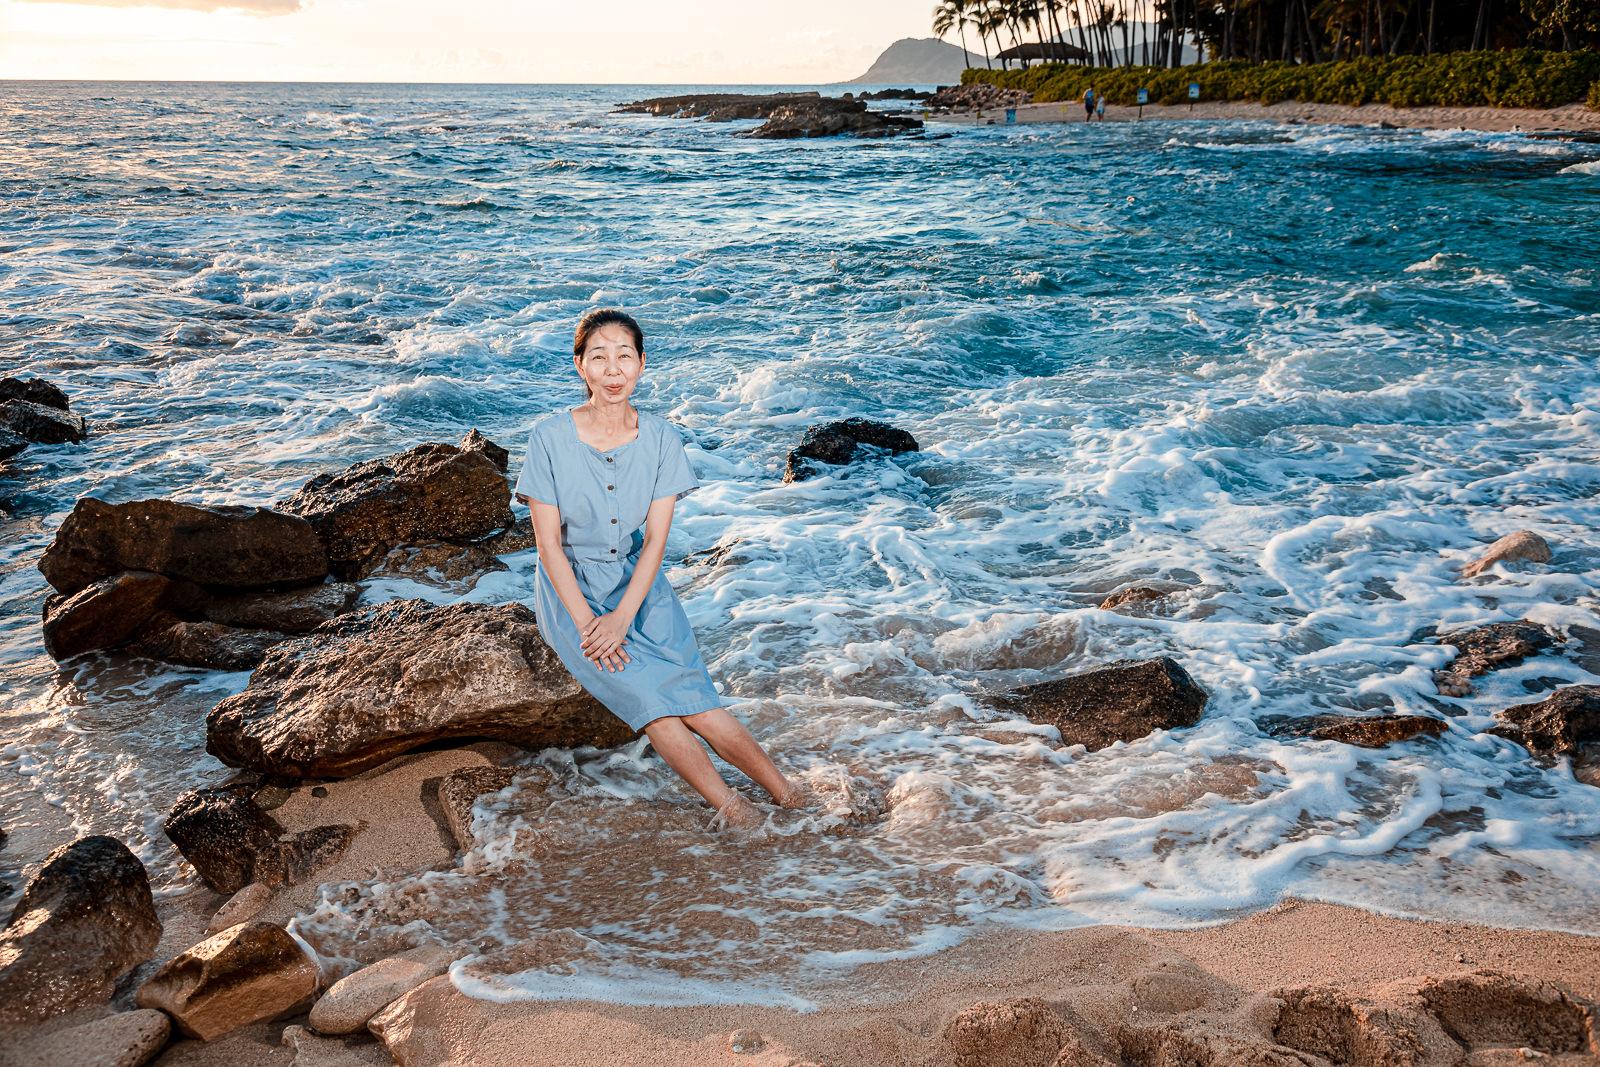 Oahu2019-9523.jpg